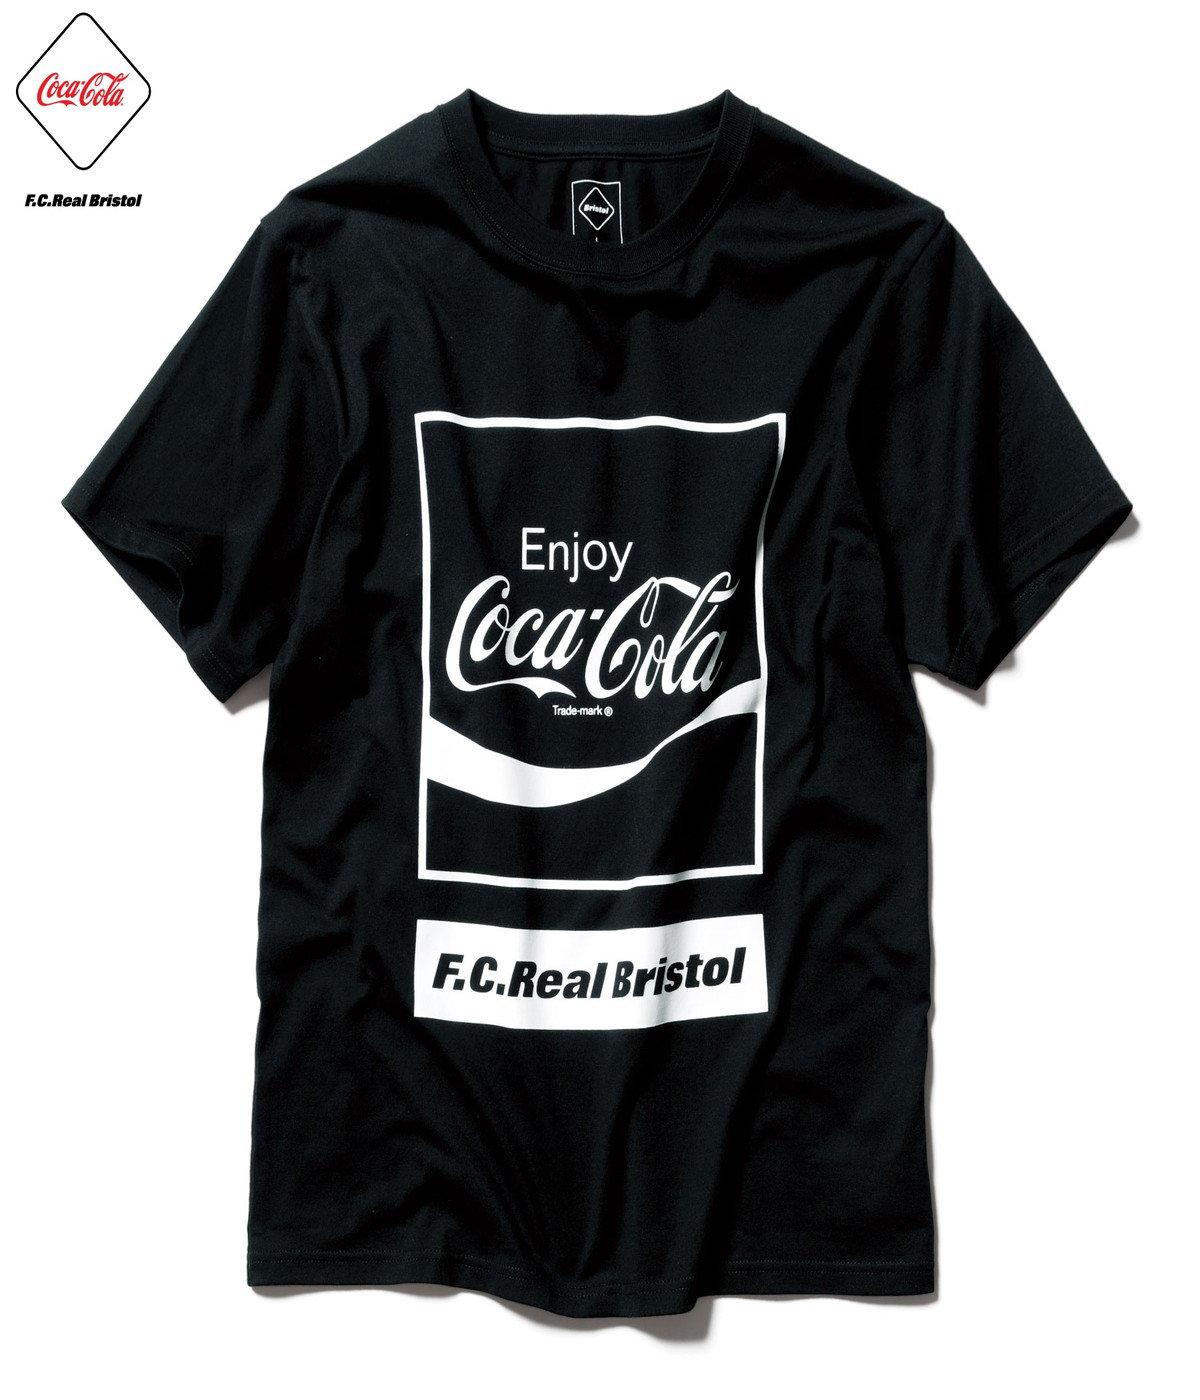 COCA-COLA BOX LOGO TEE